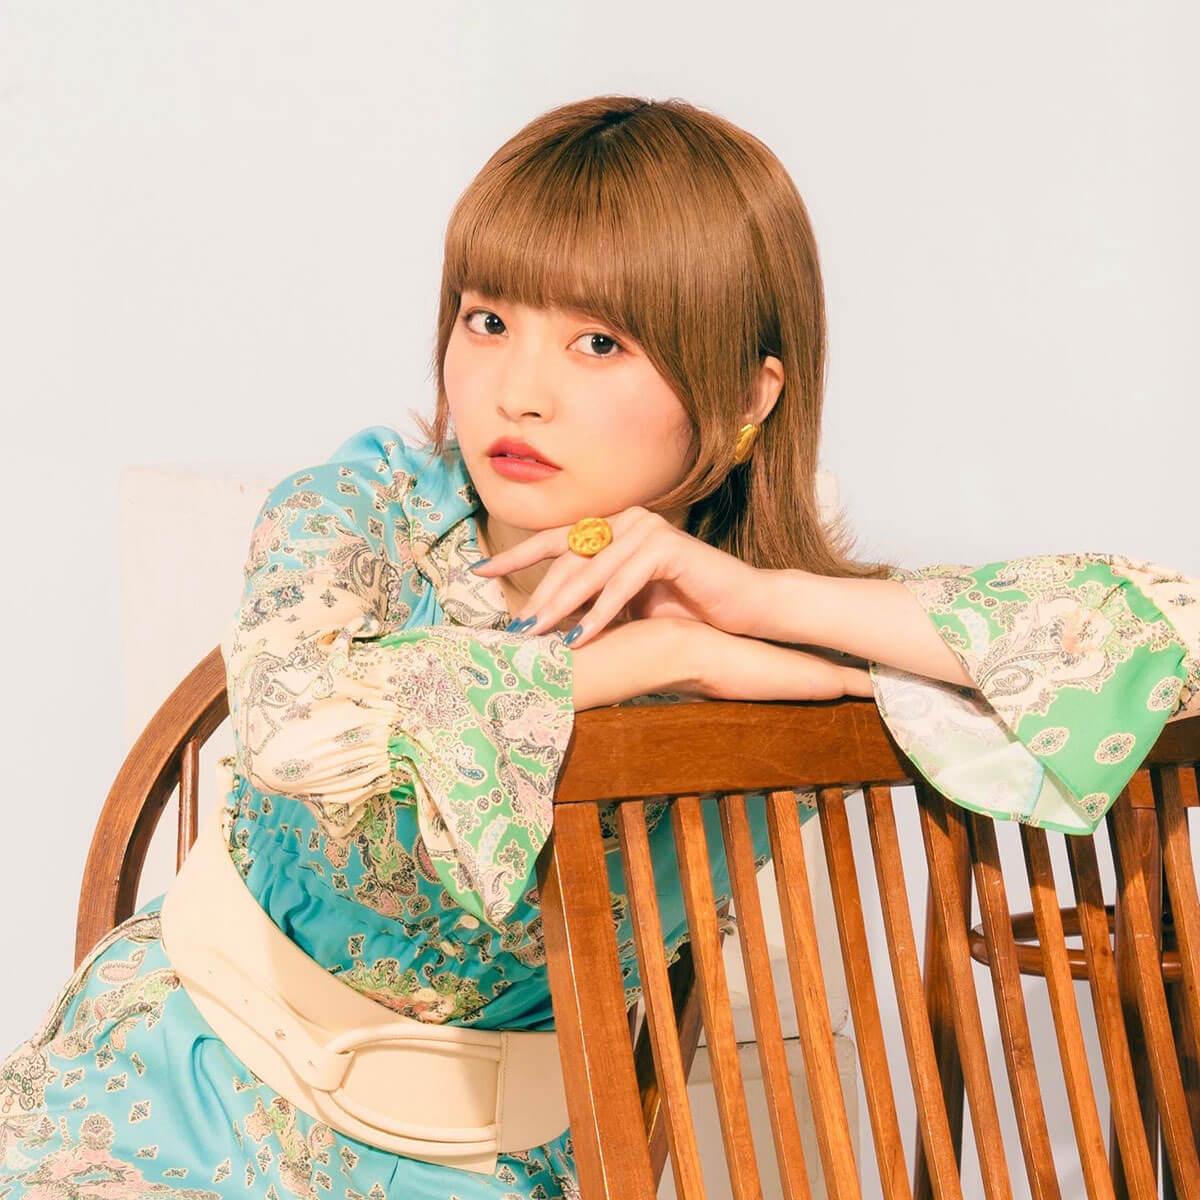 Nagie Lane・reiに決定!『ヴァイナル・ミュージック~歌謡曲2.0~』9月木曜パーソナリティ